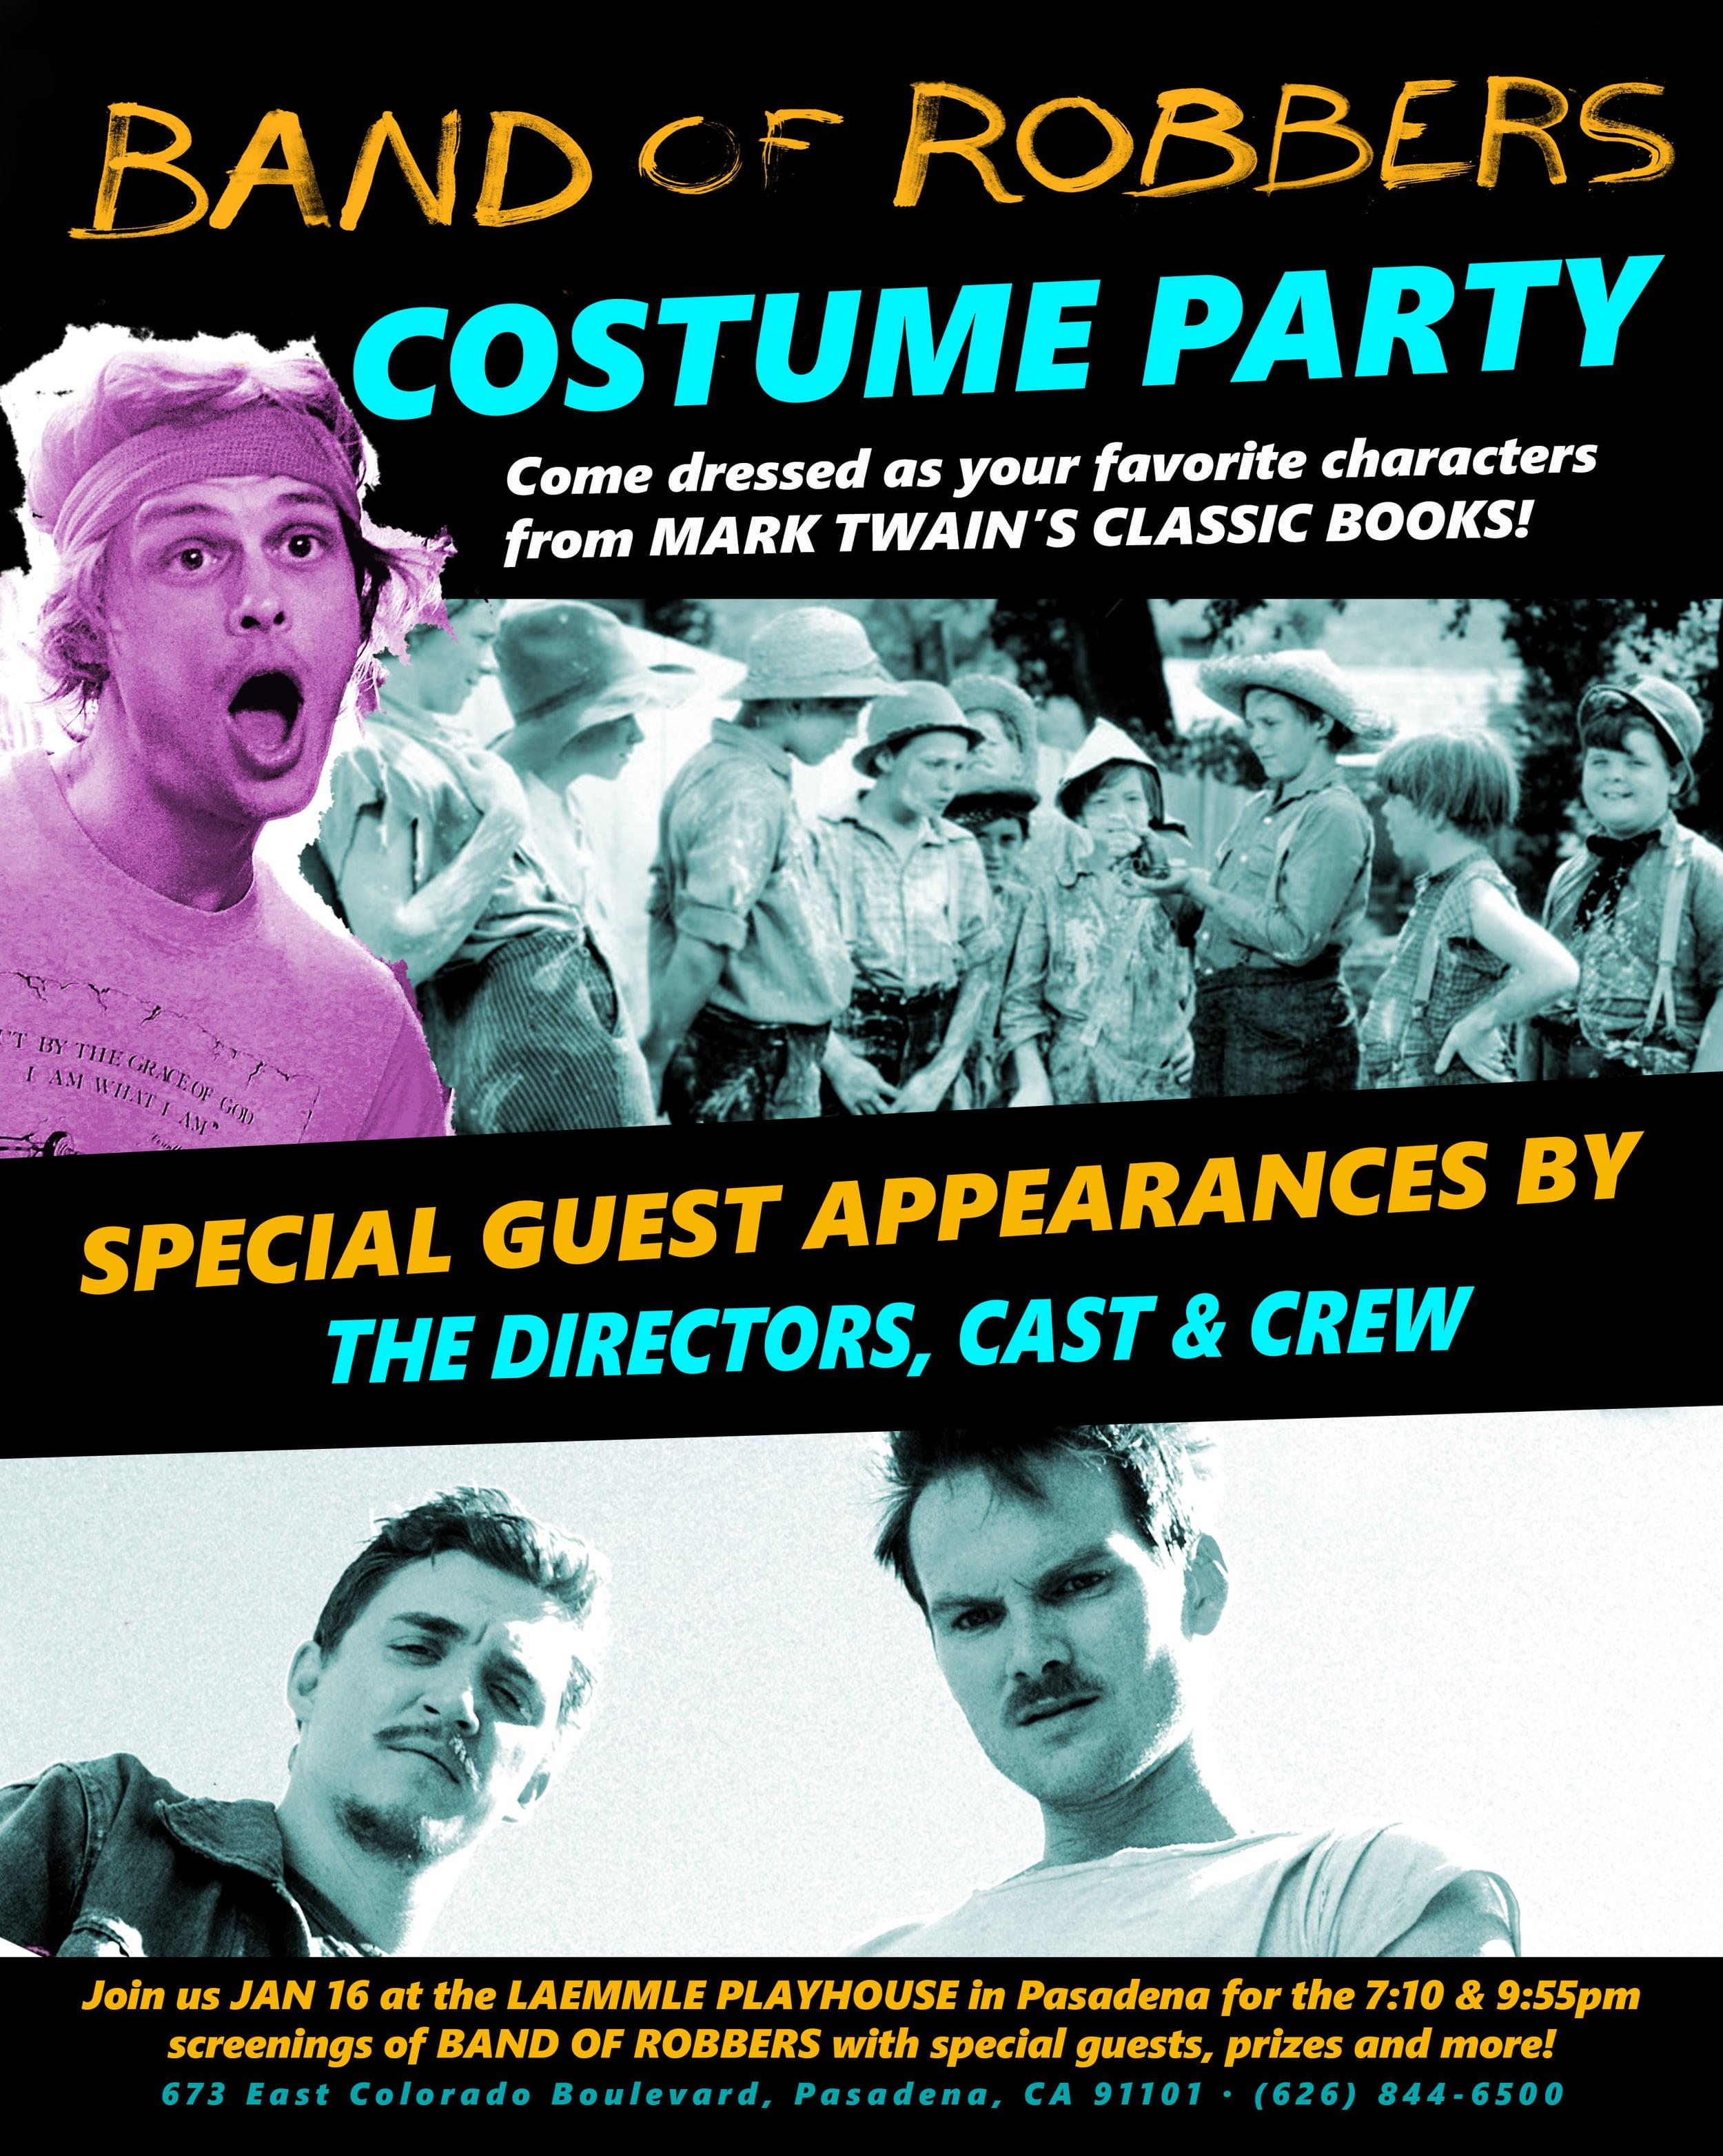 costumeParty_02.jpg